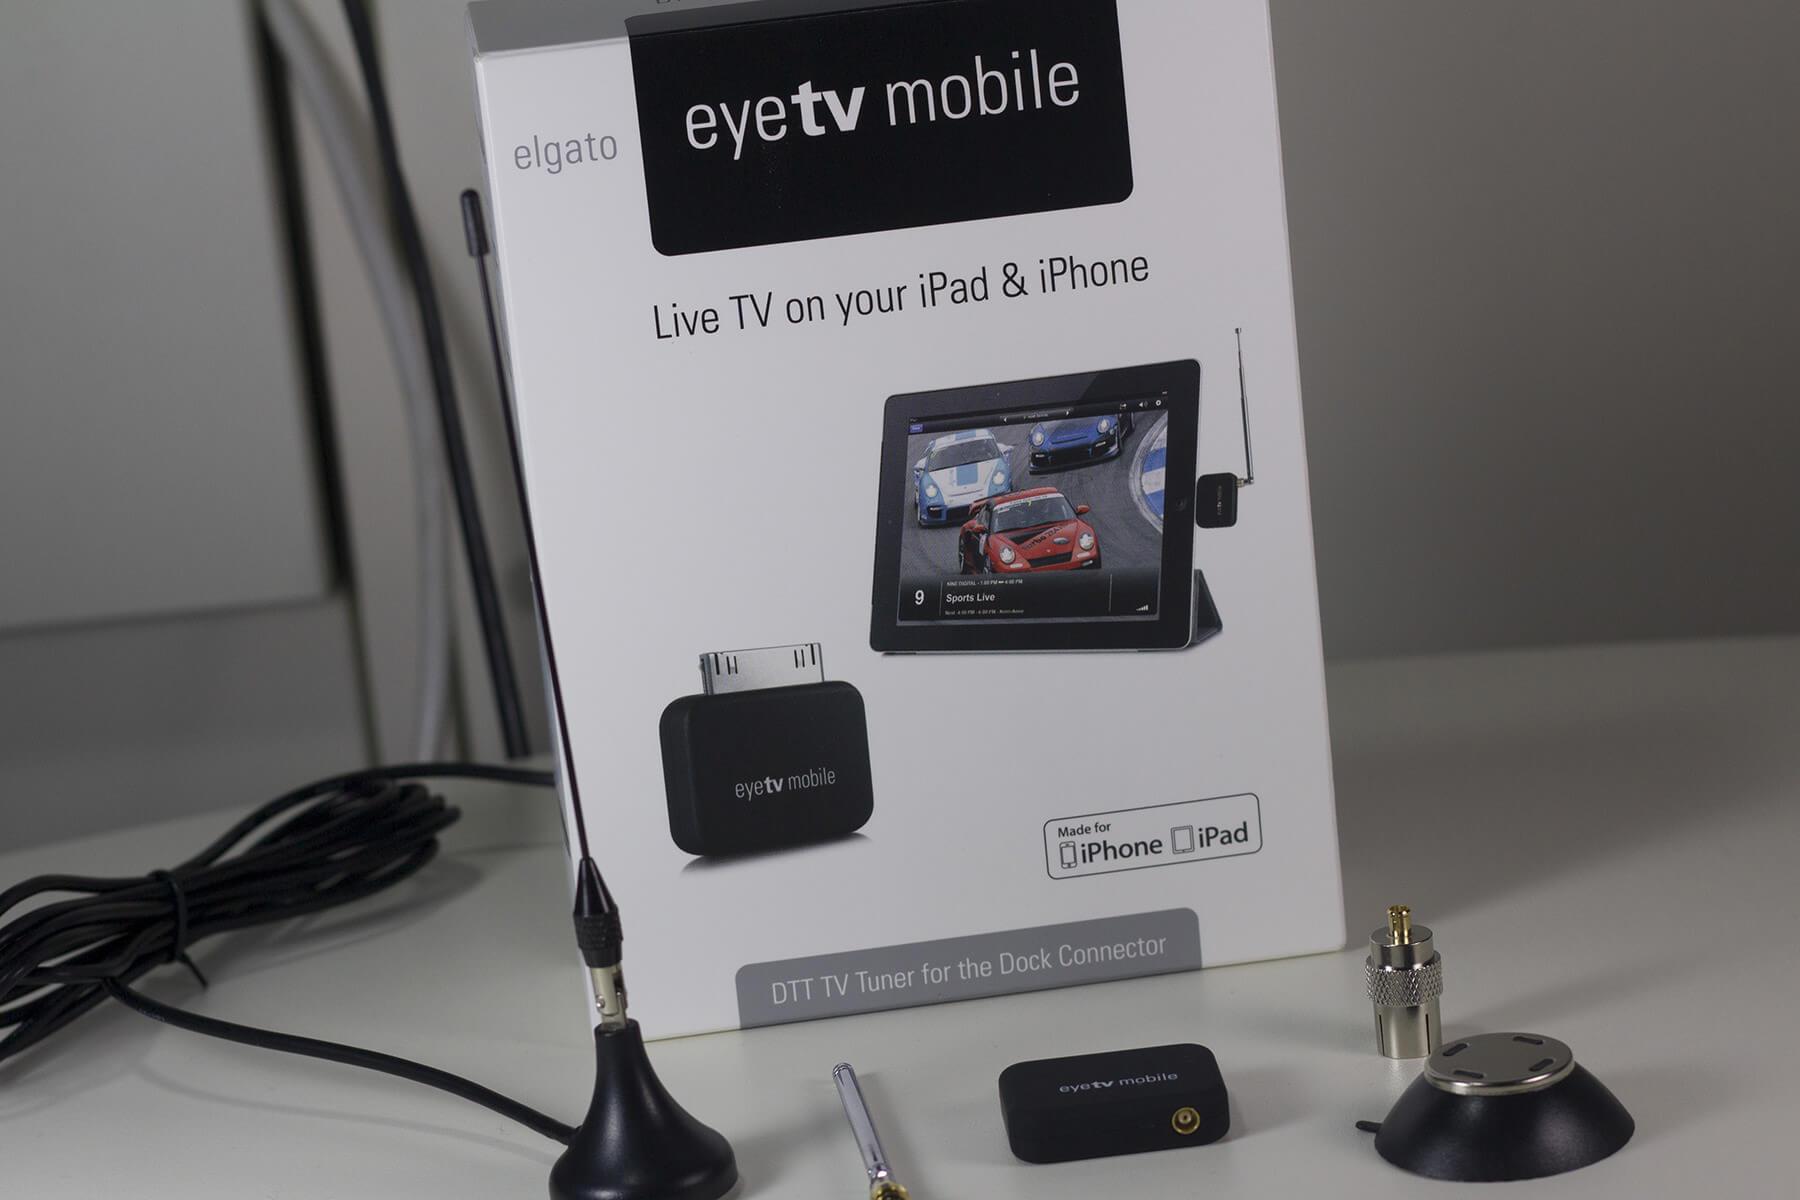 EyeTV mobile – смотрим телевидение на iPhone, iPad и Android без интернета